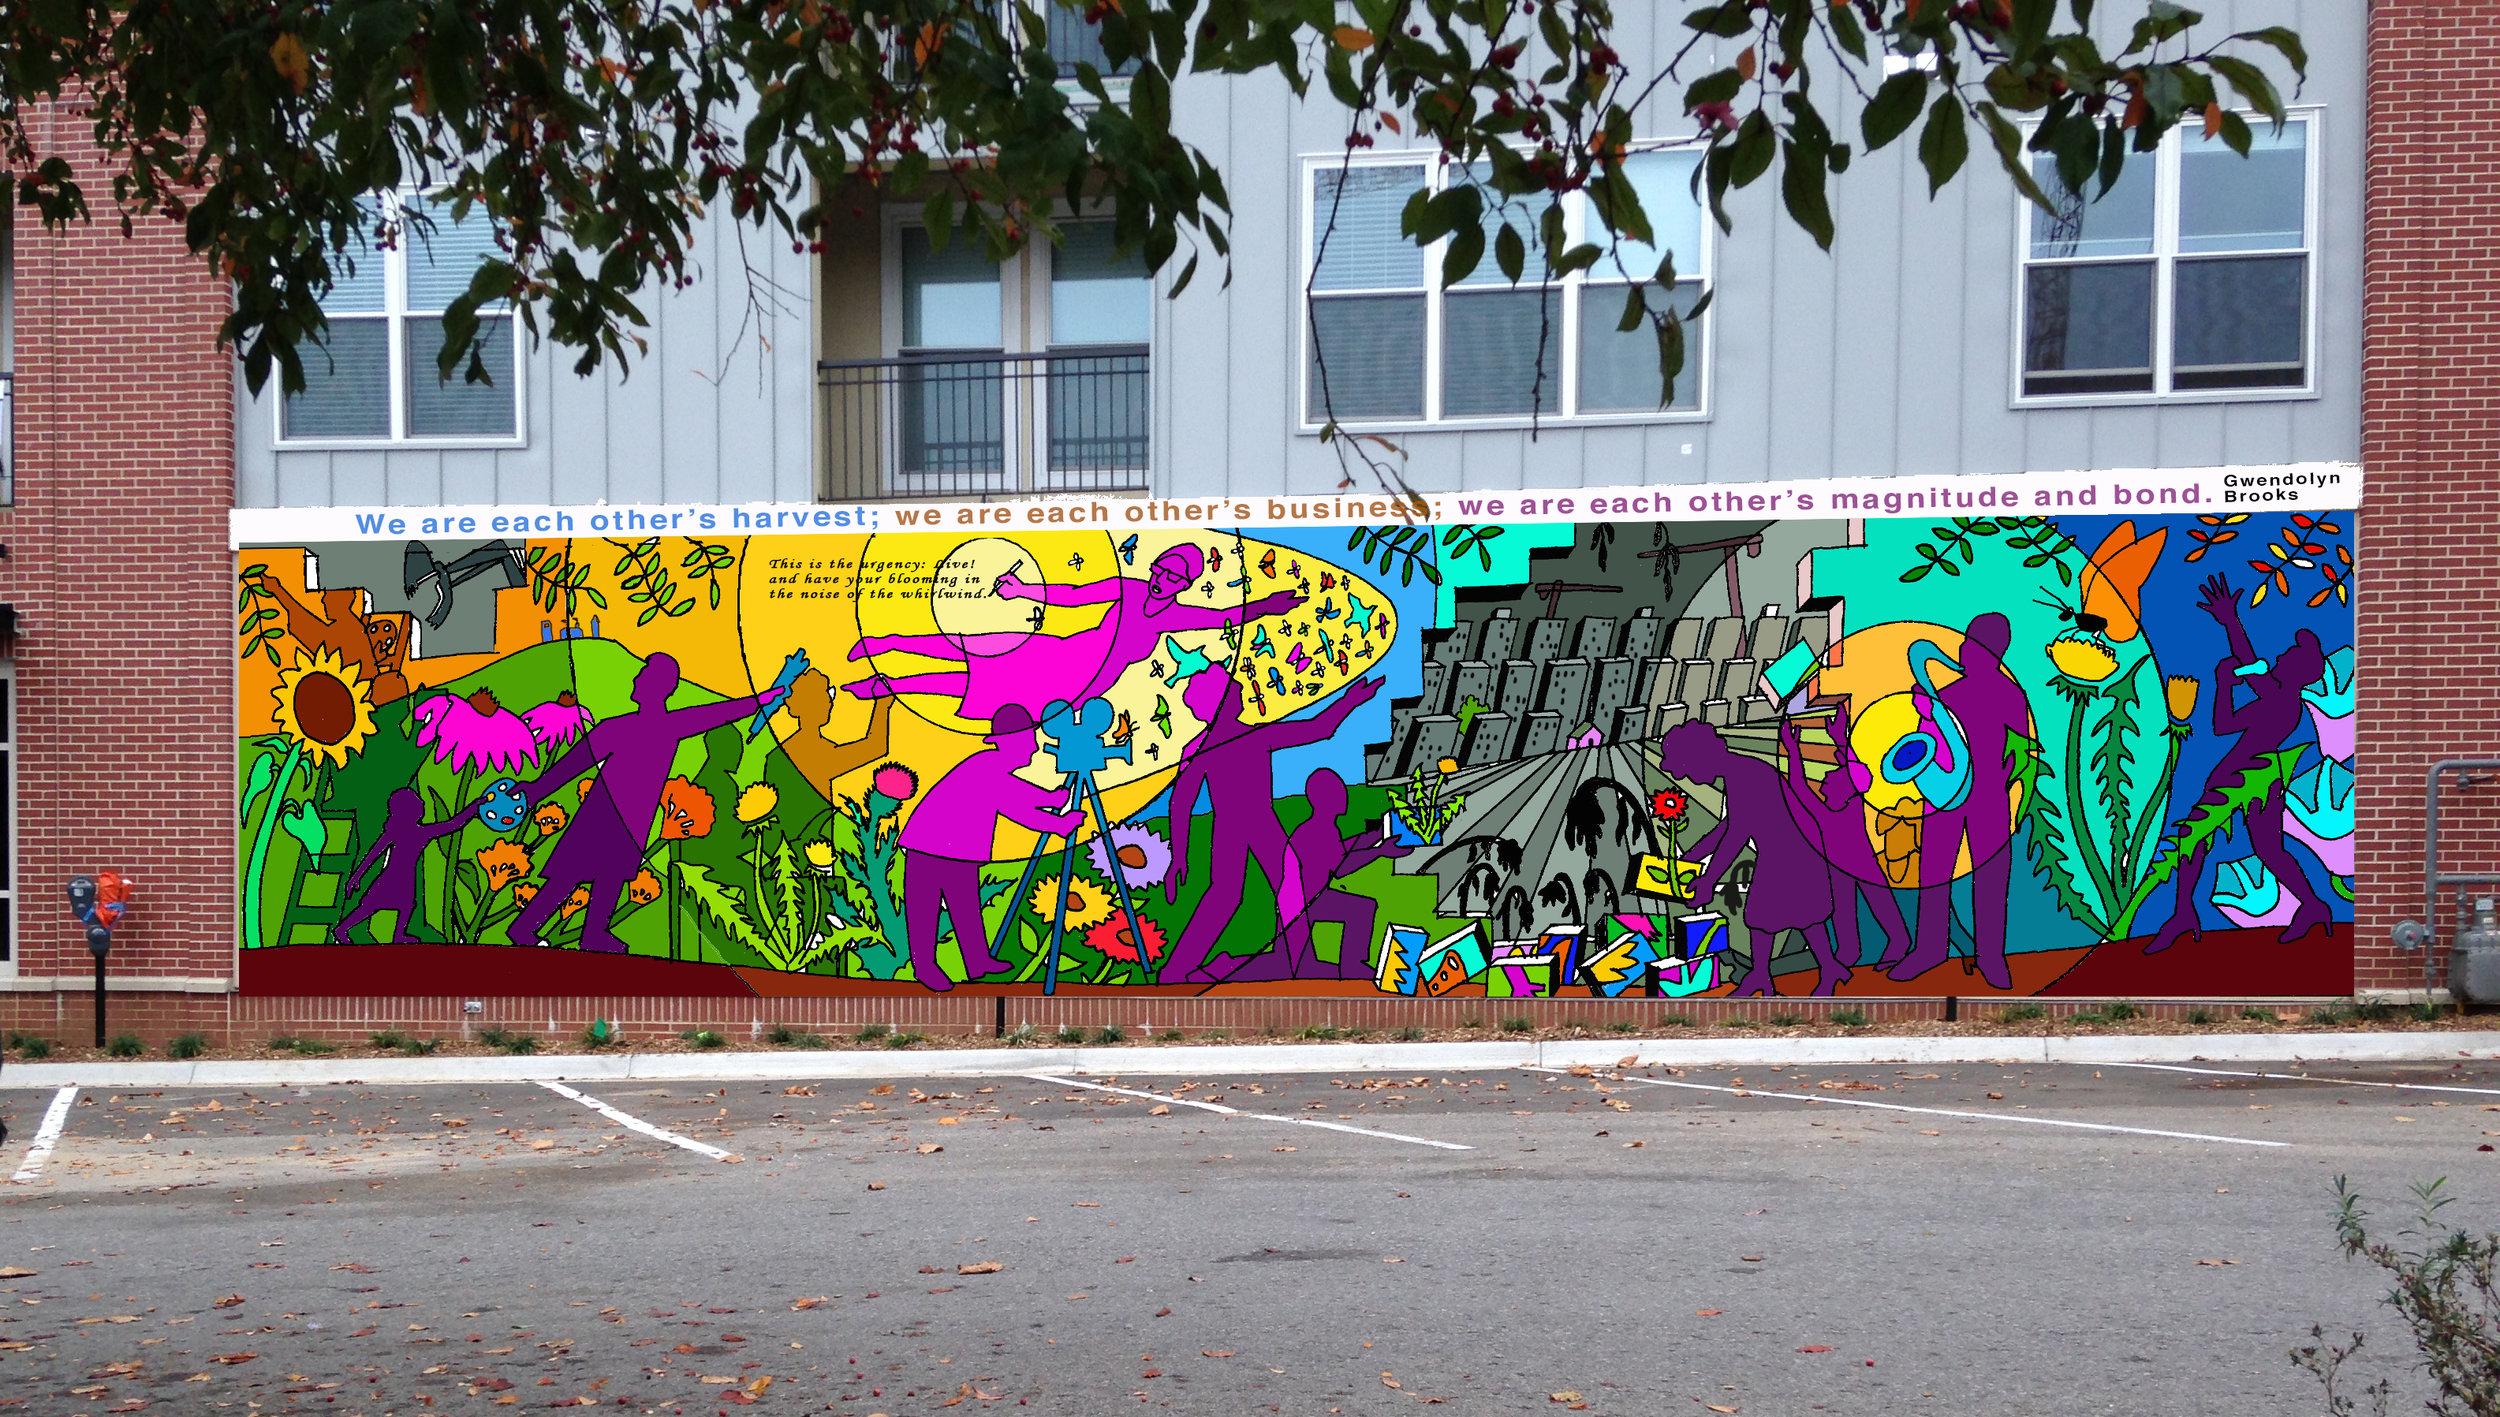 Preliminary color-study of the mural design